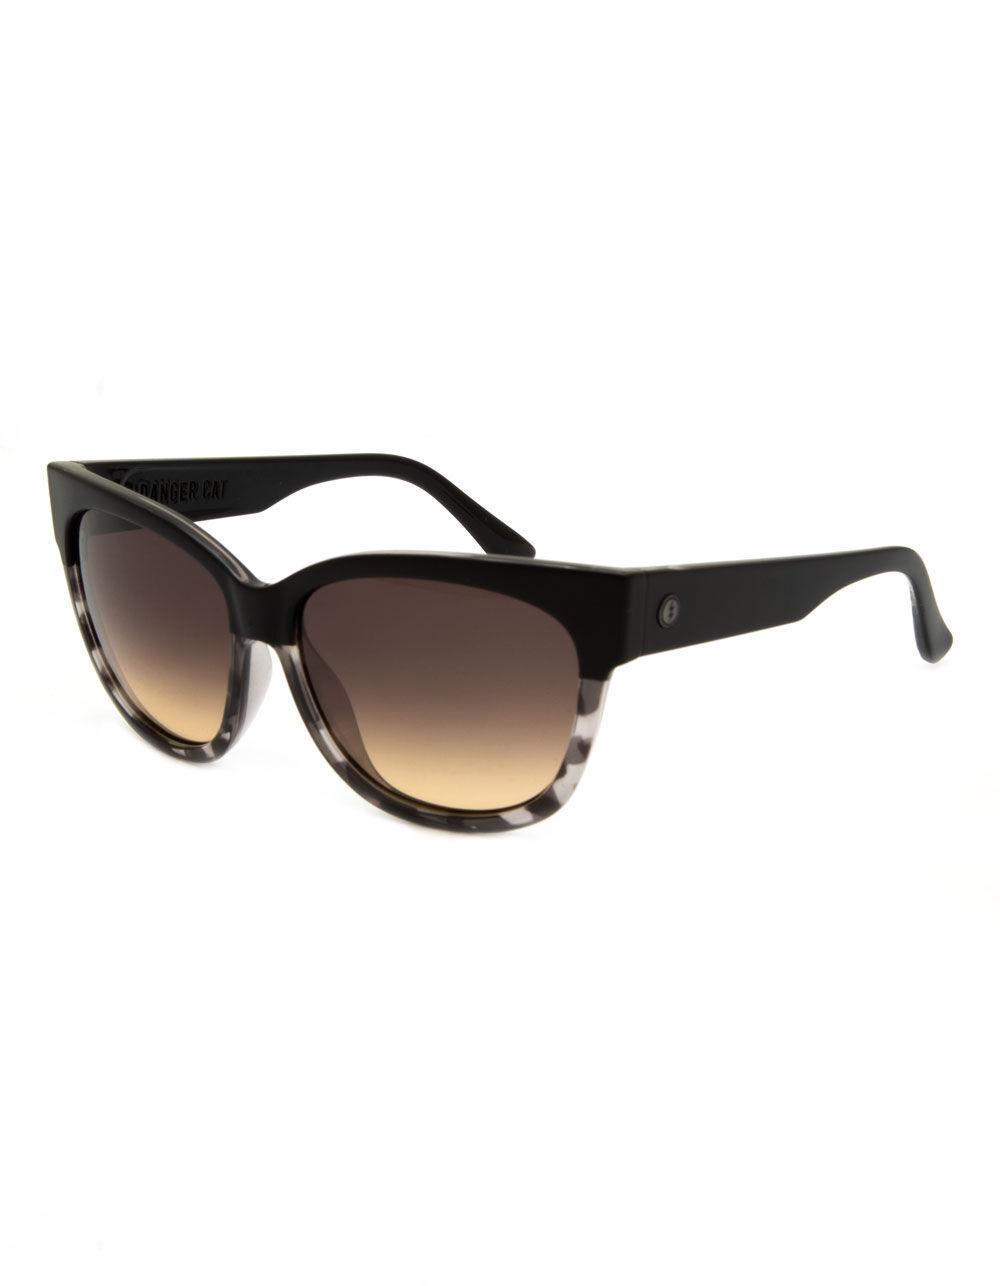 ELECTRIC Danger Cat Tortoise Sunglasses